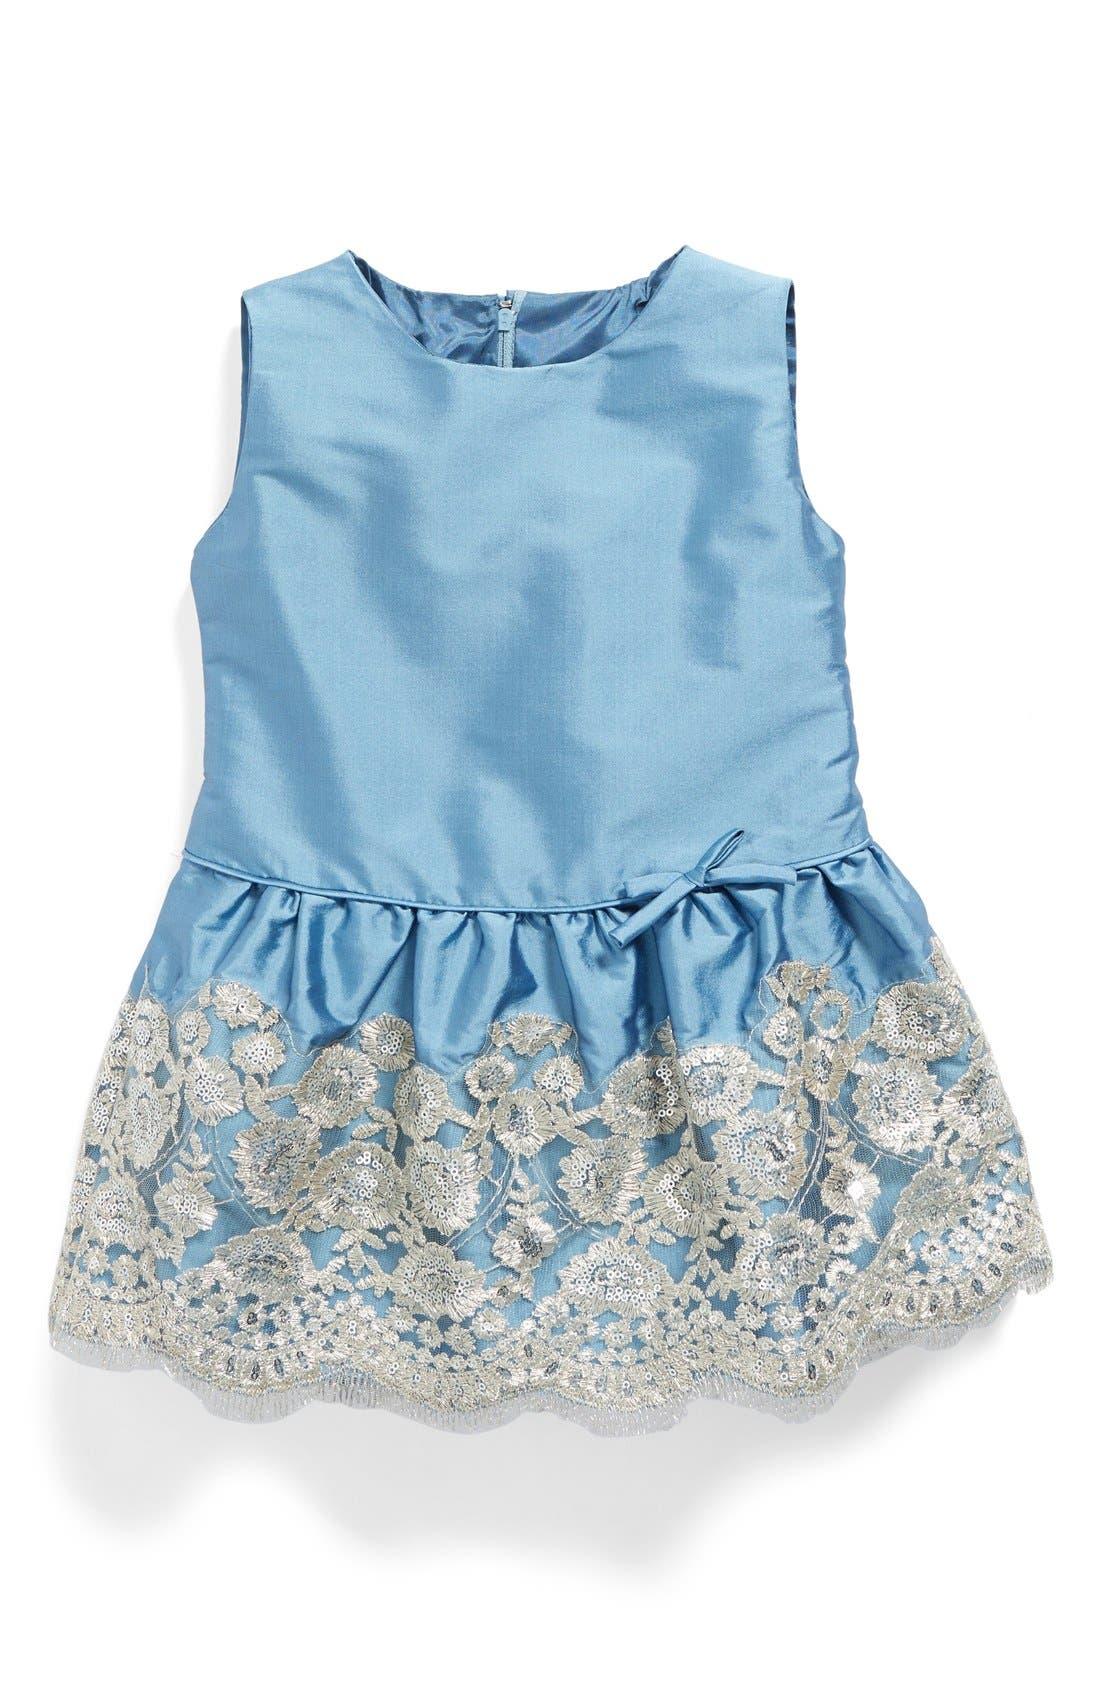 Drop Waist Dress,                             Main thumbnail 1, color,                             Sky Taffeta